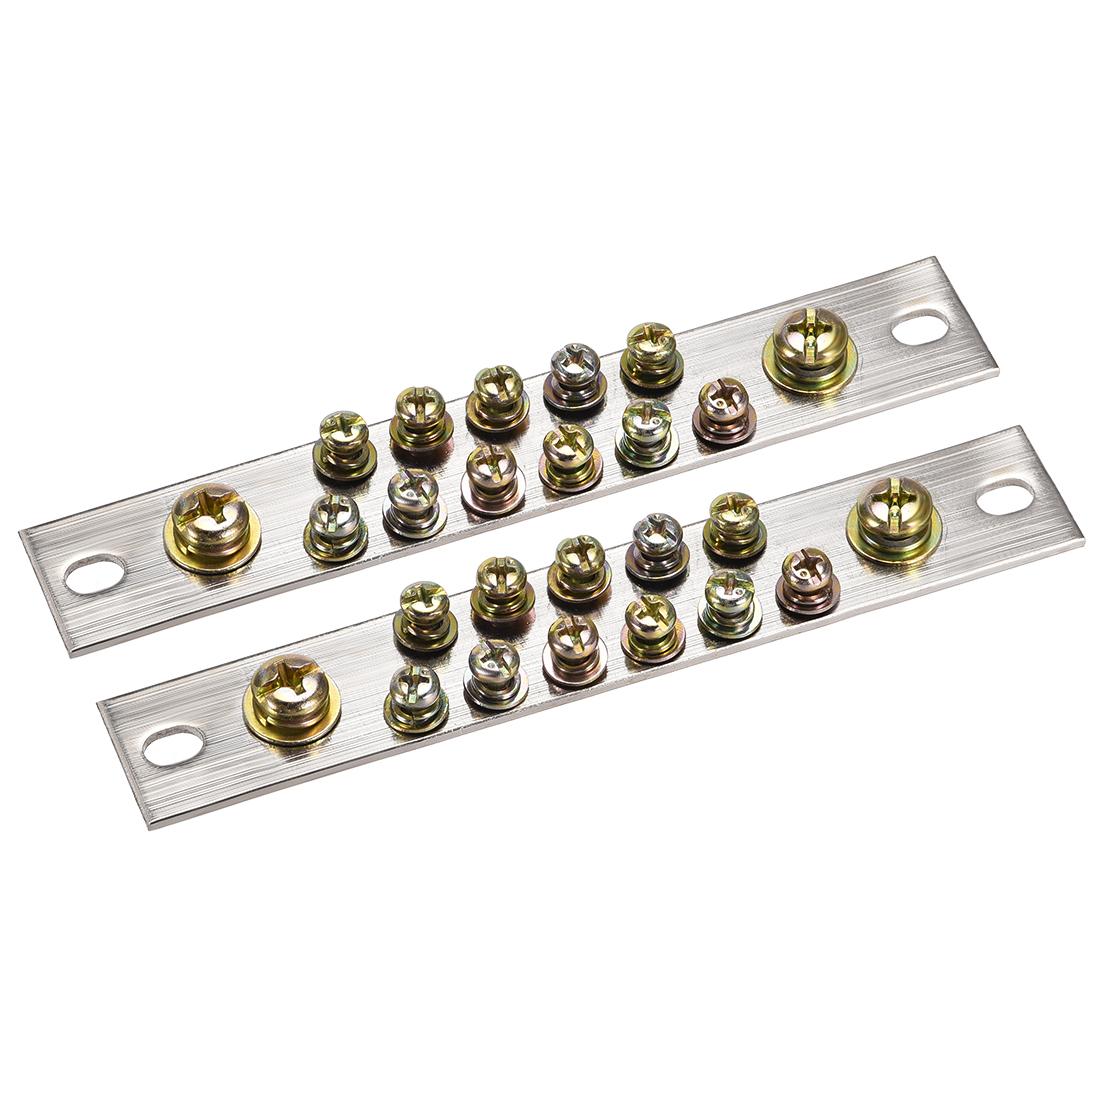 Copper Screw Terminal Block Connector Bar 100A Double Row 13 Positions 2 Pcs